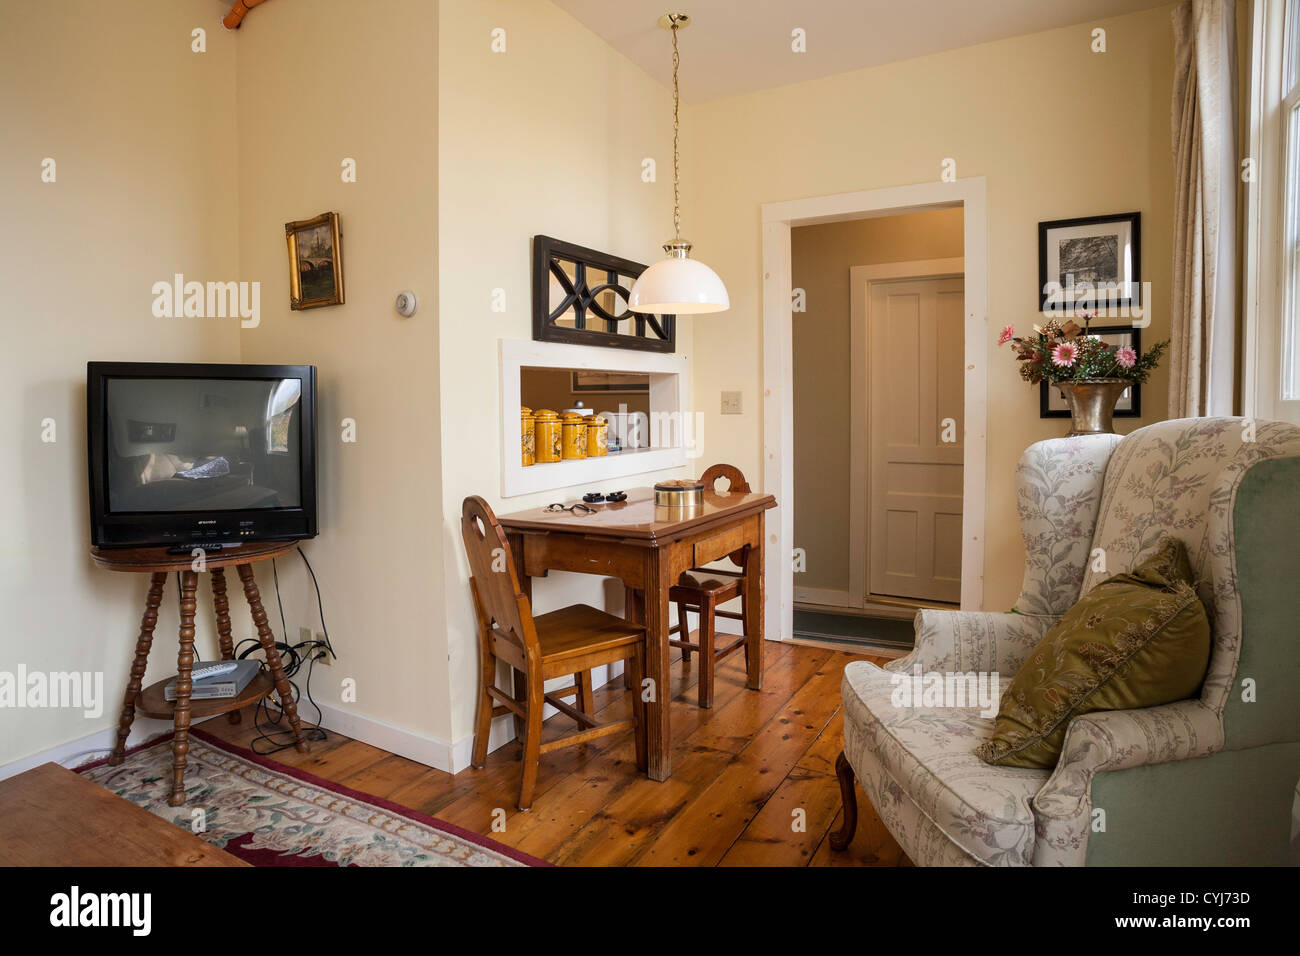 Efficiency Apartment Interior, USA